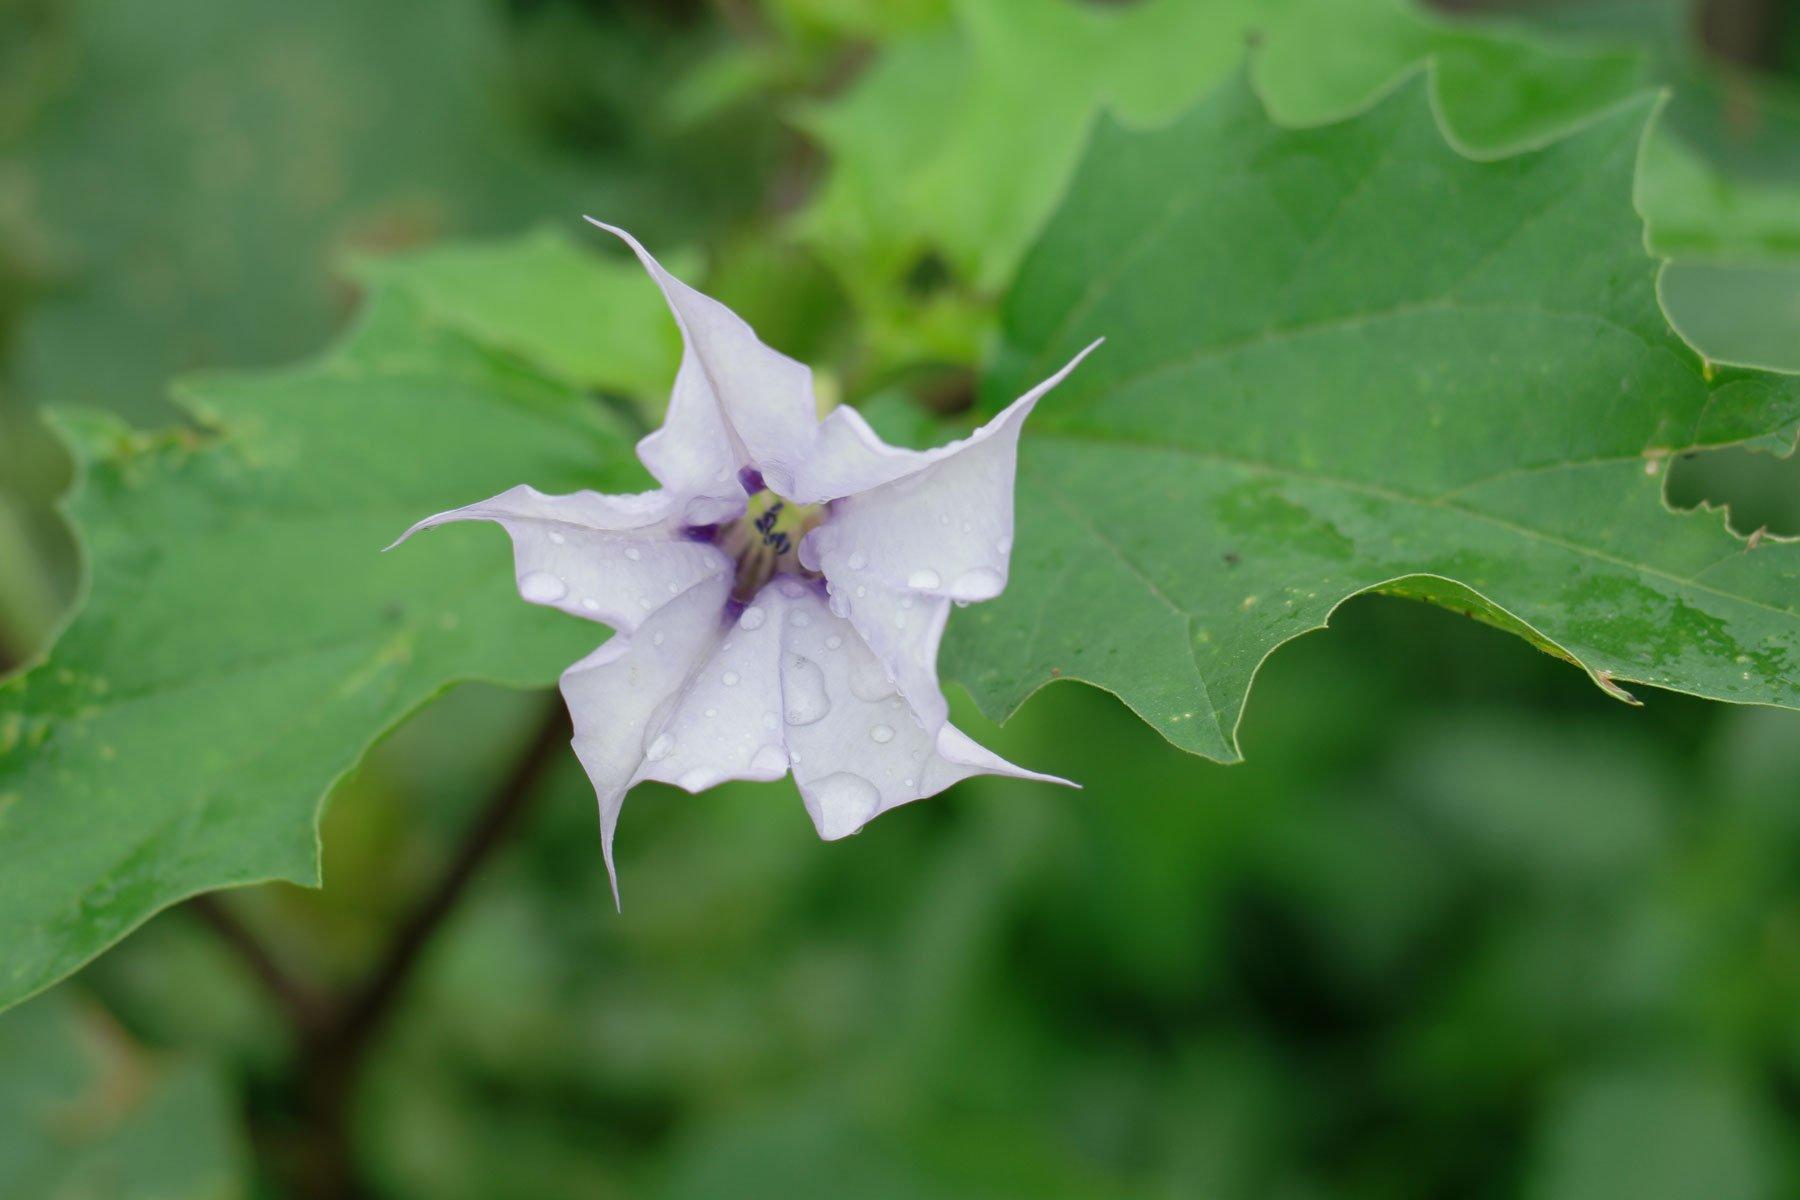 Stechapfel violett